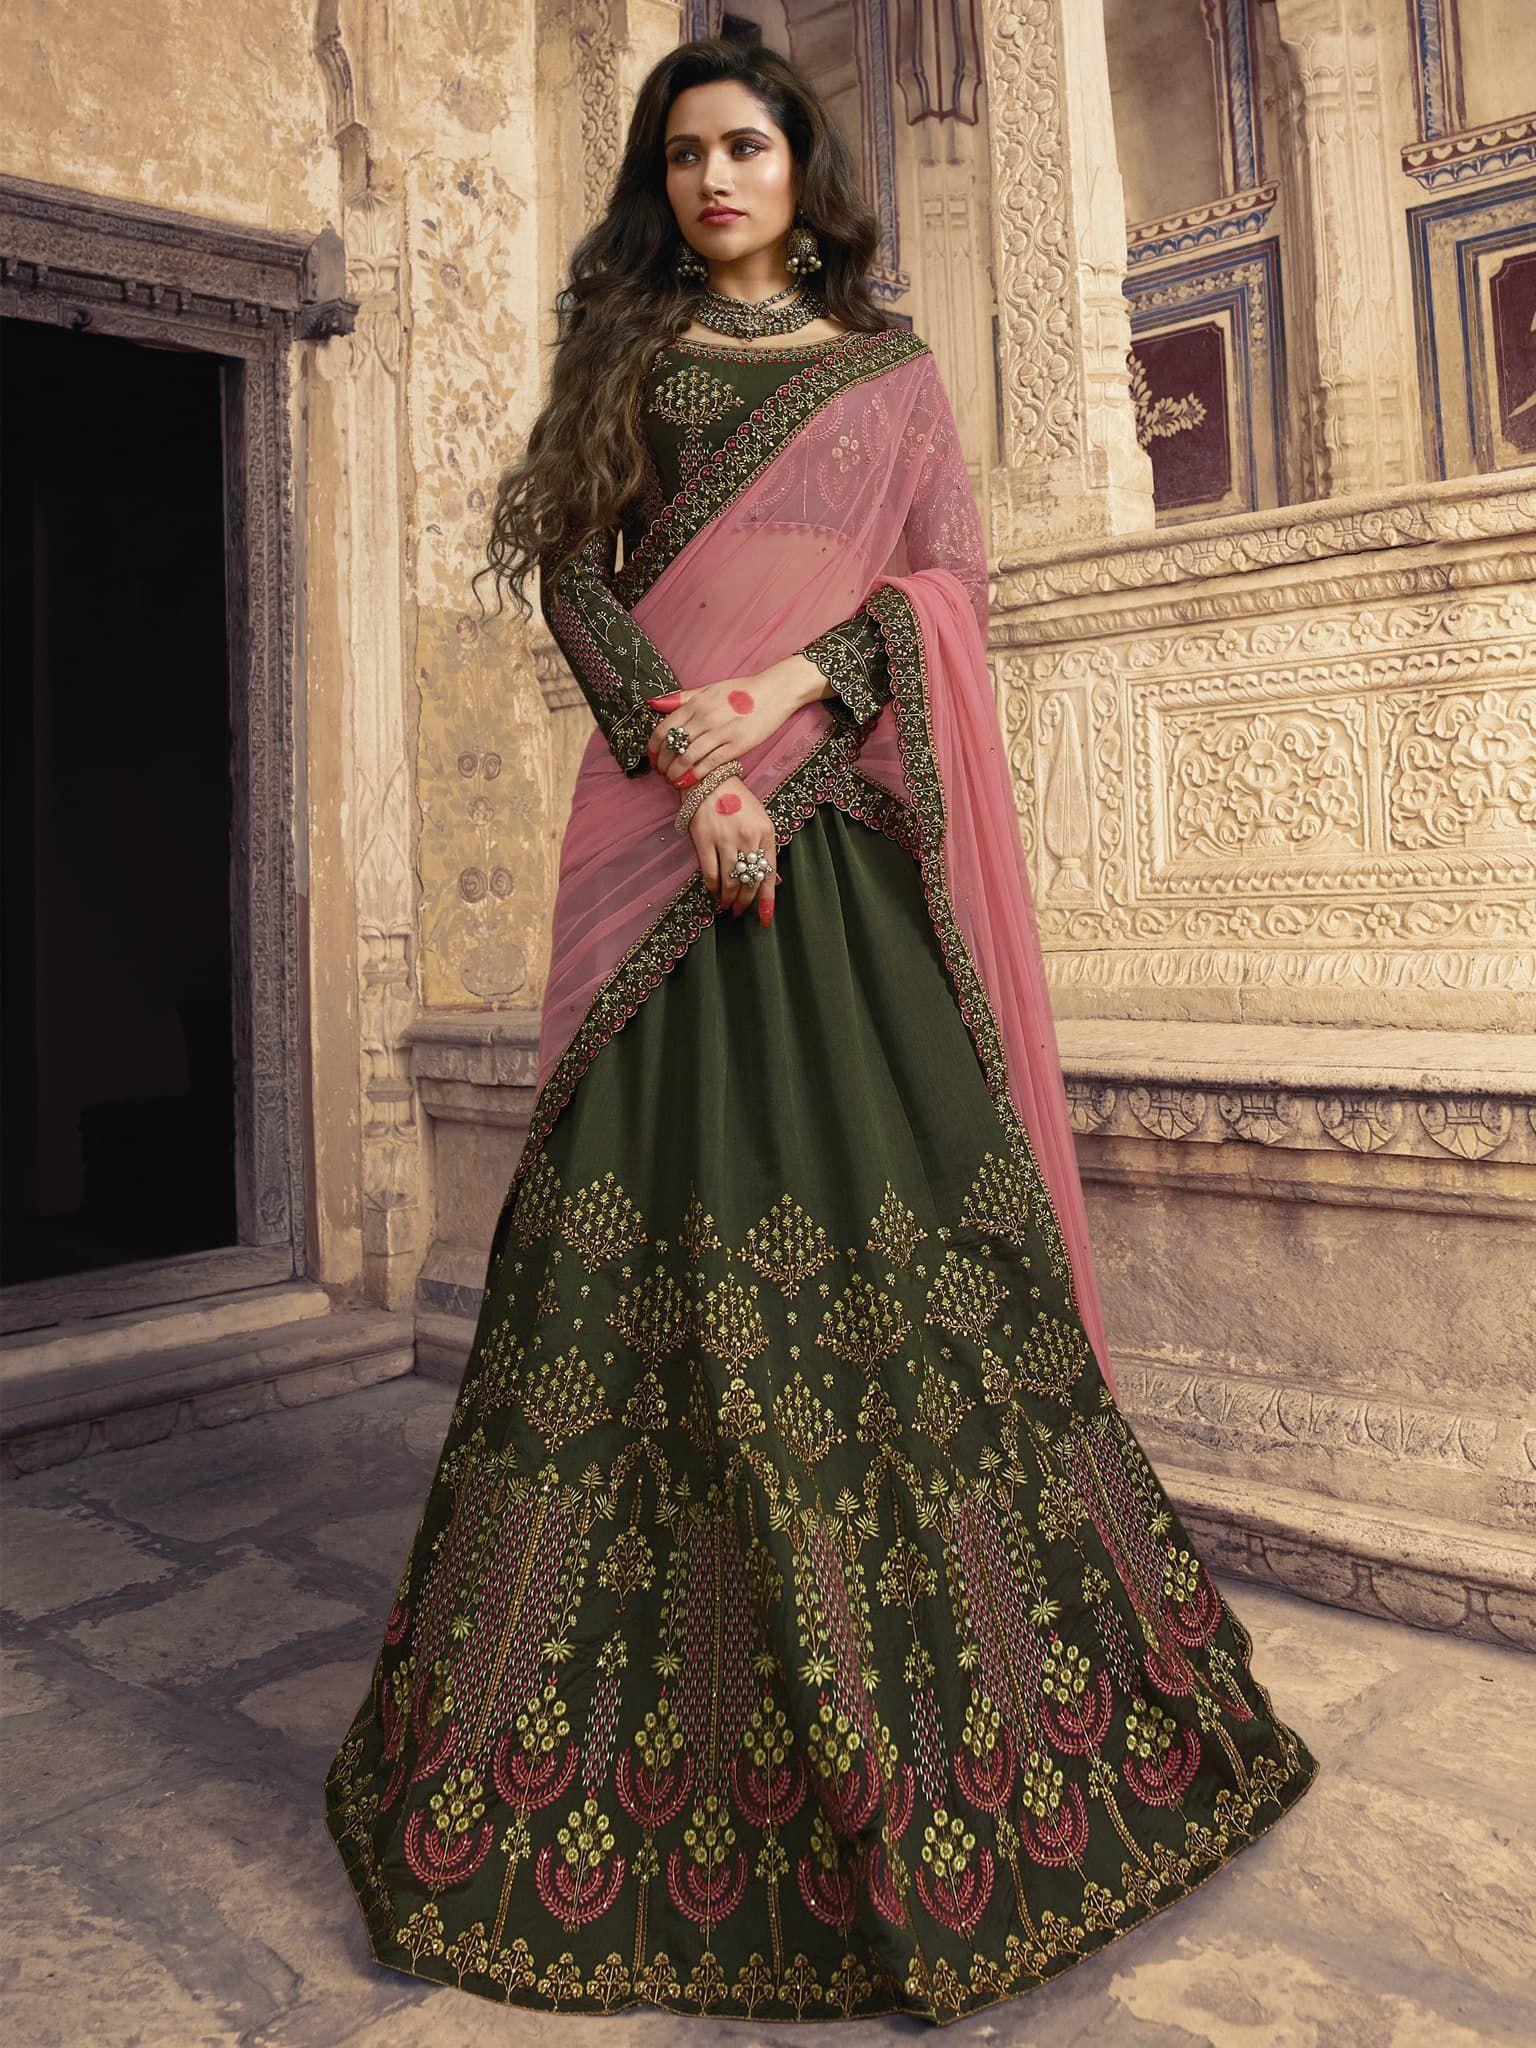 3aa0ff3d51 Dark Mehndi Green Color Barfi Silk Fabric Heavy Zari, Resham Embroidery  With Hand Work And Lace Border Lehenga Choli